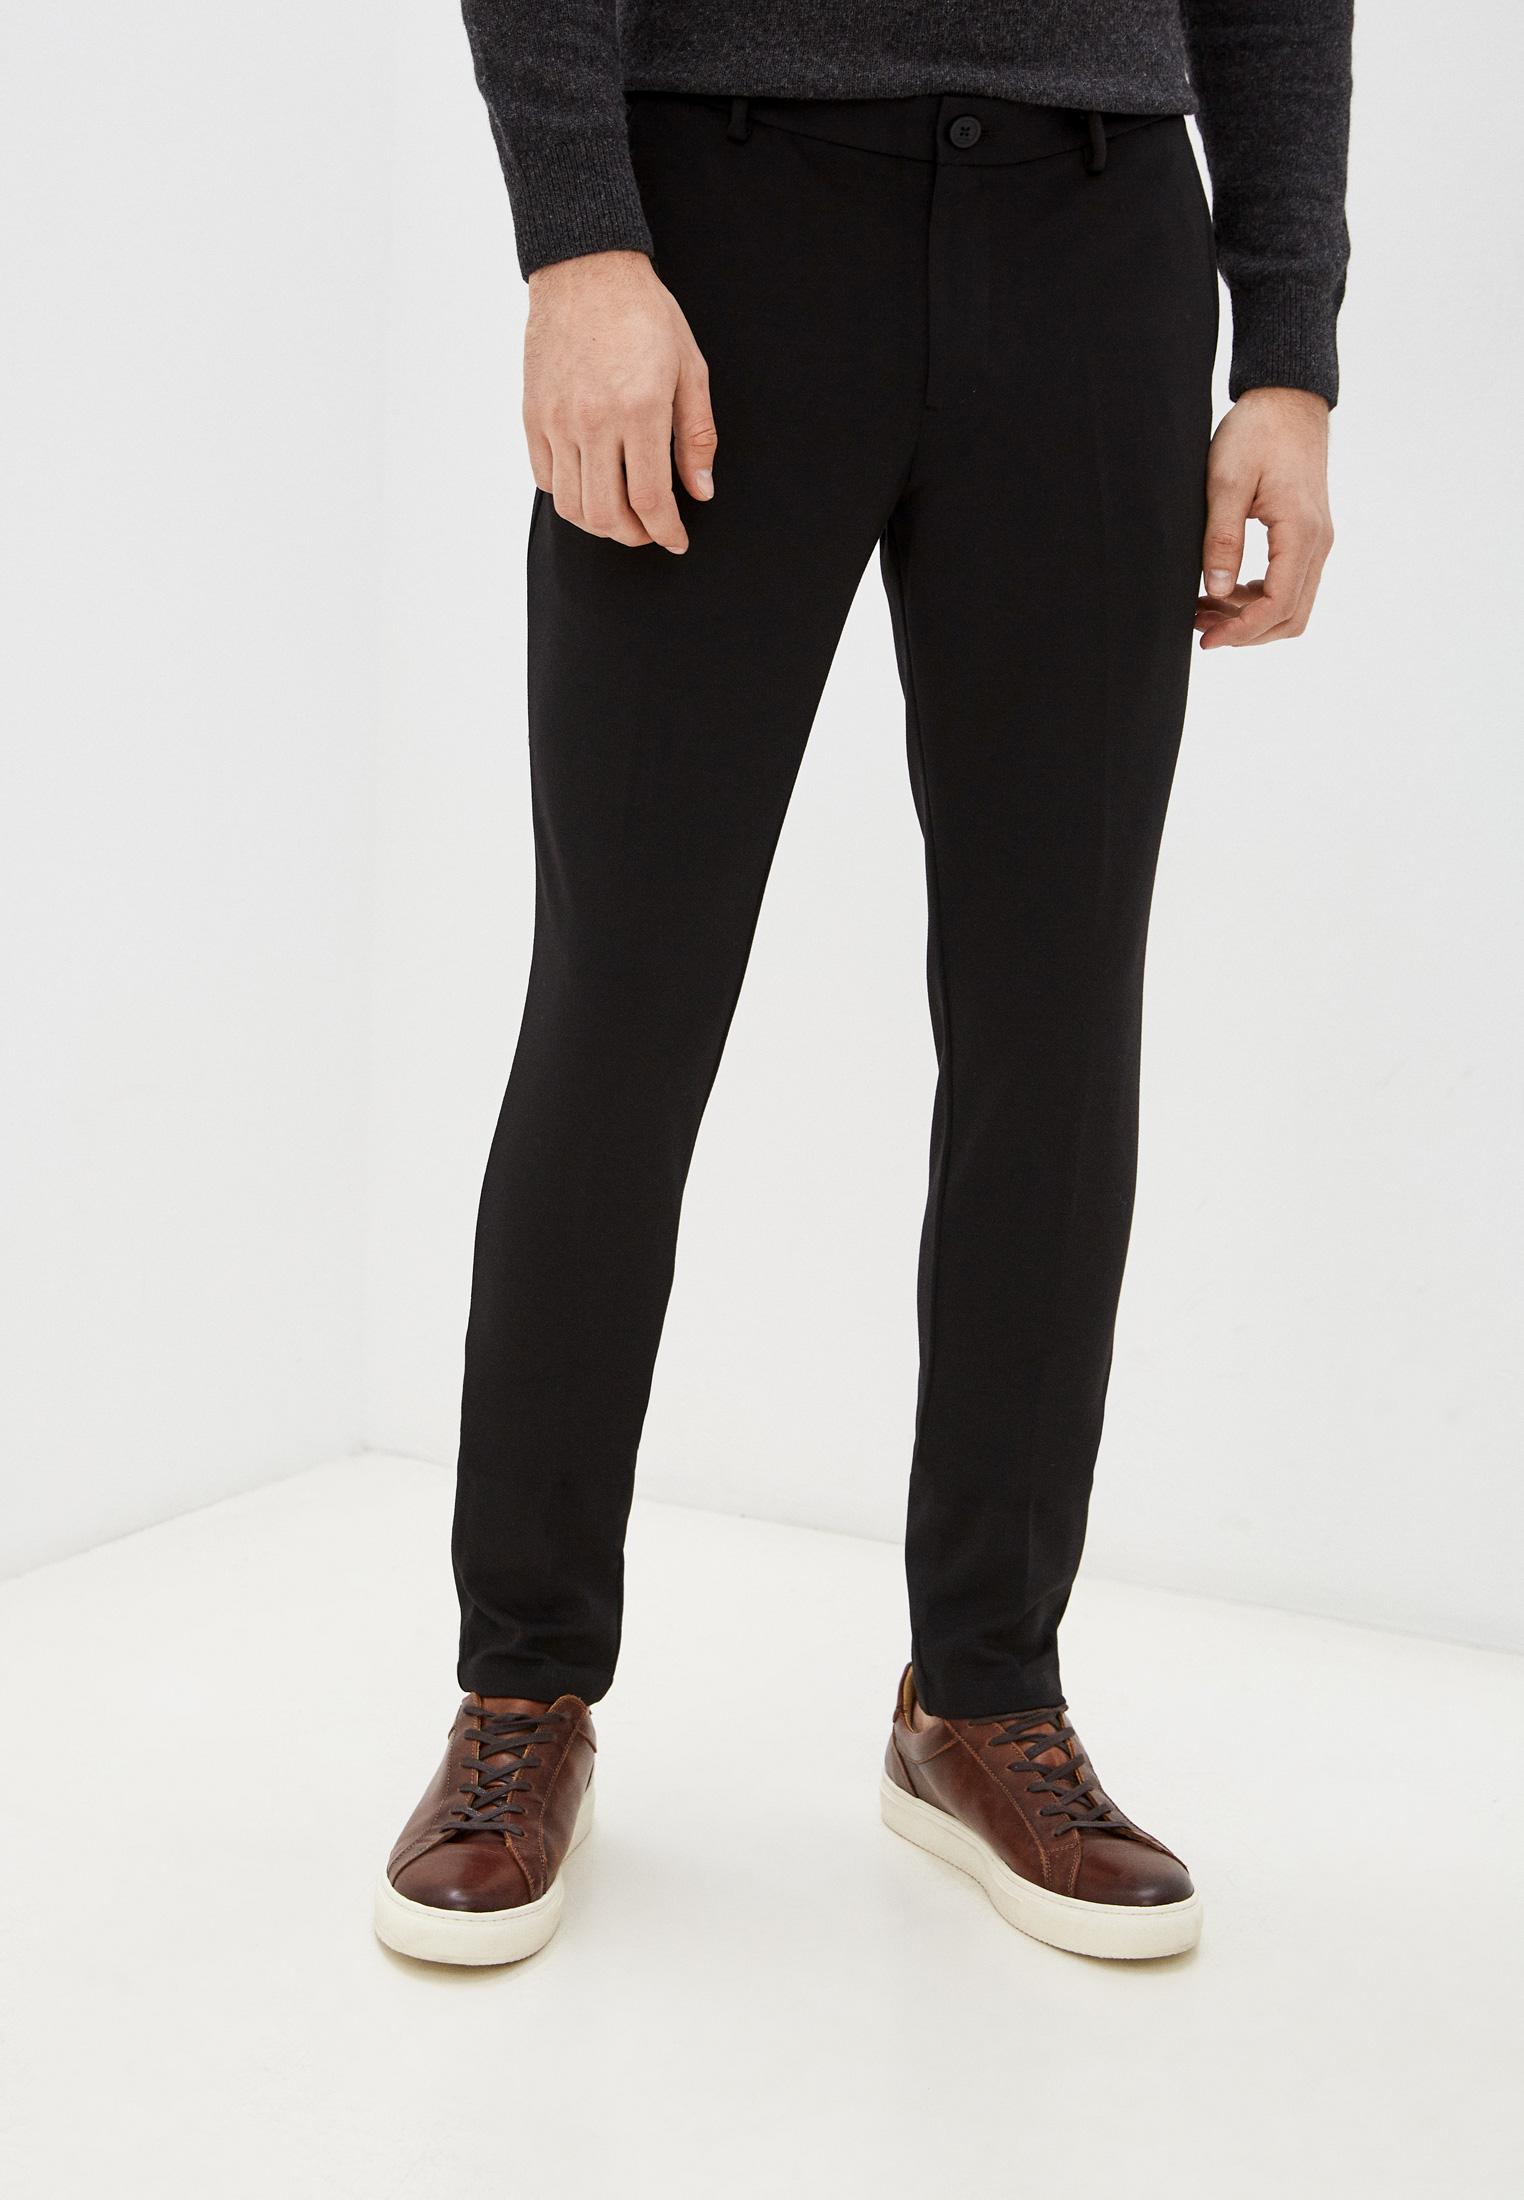 Мужские классические брюки Mexx (Мекс) Брюки Mexx